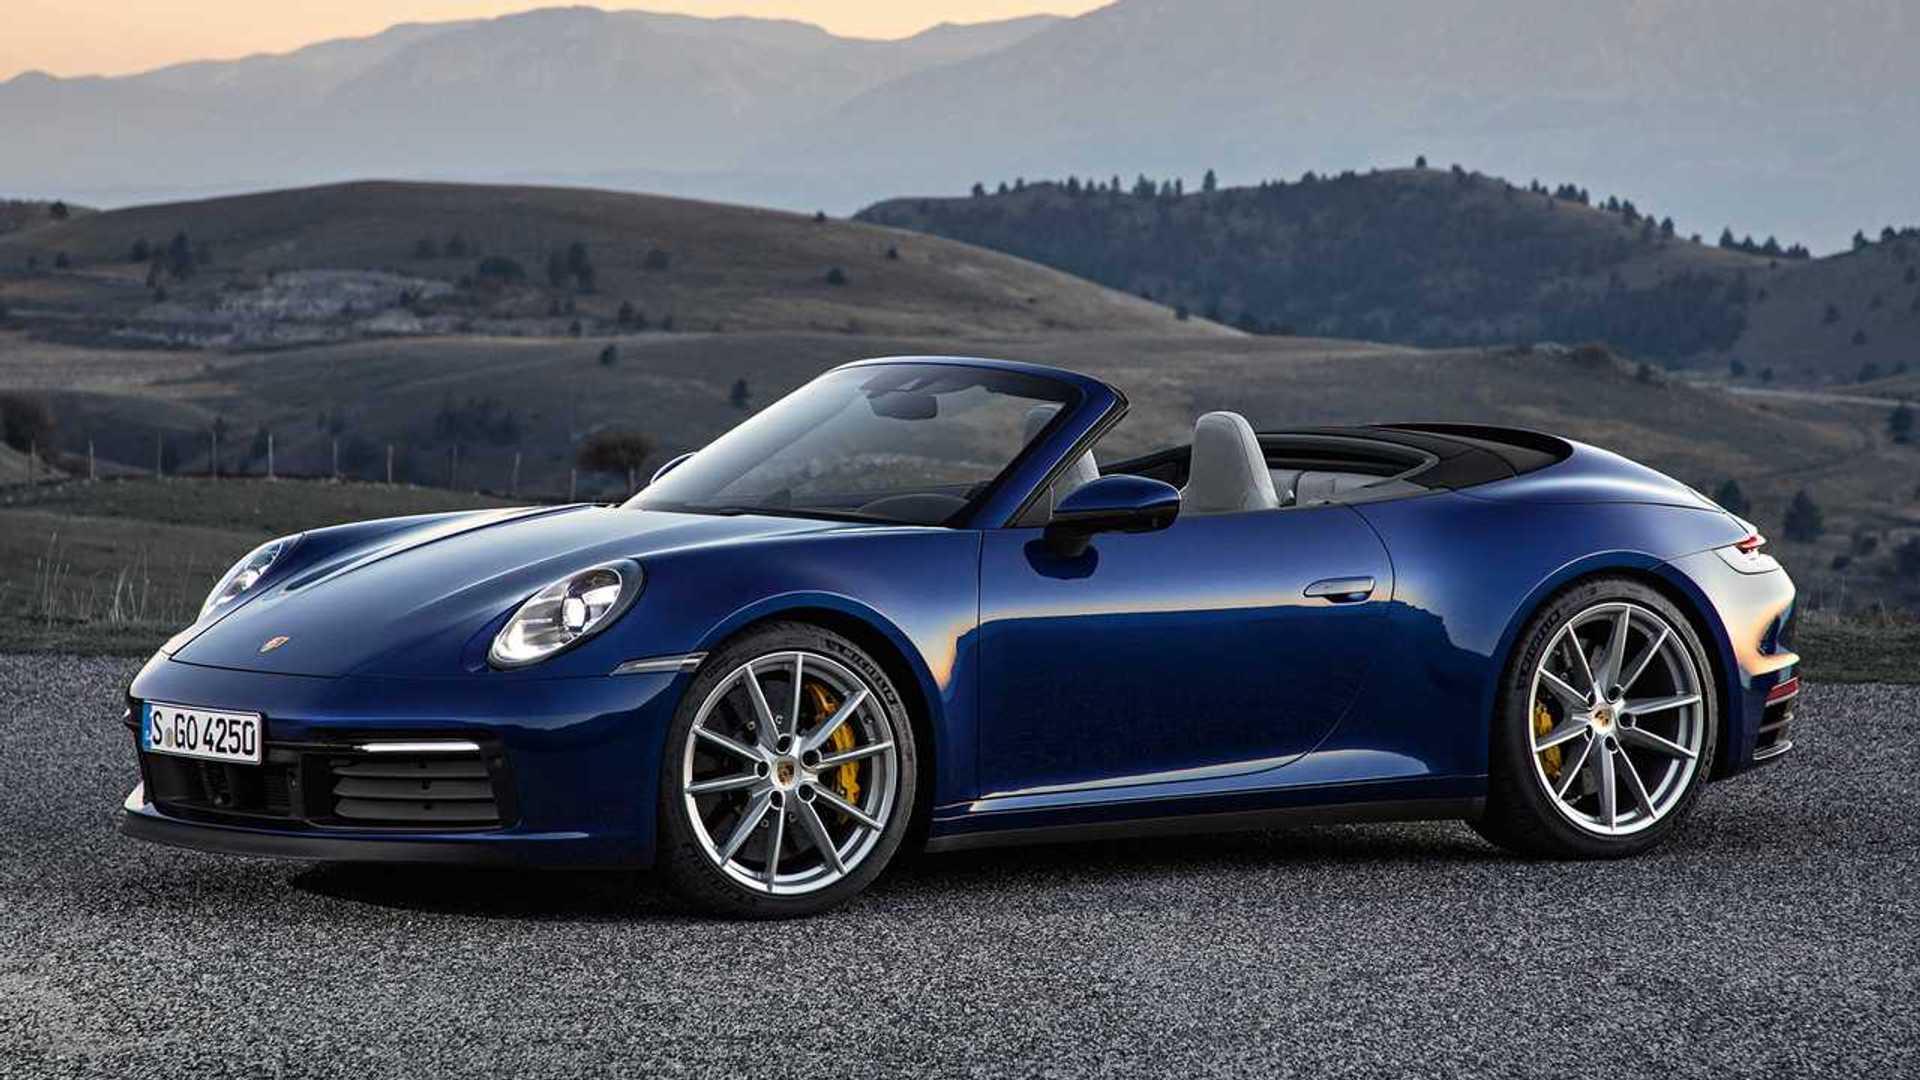 2020 Porsche 911 Cabriolet Debuts With 443 HP, Unlimited Headroom